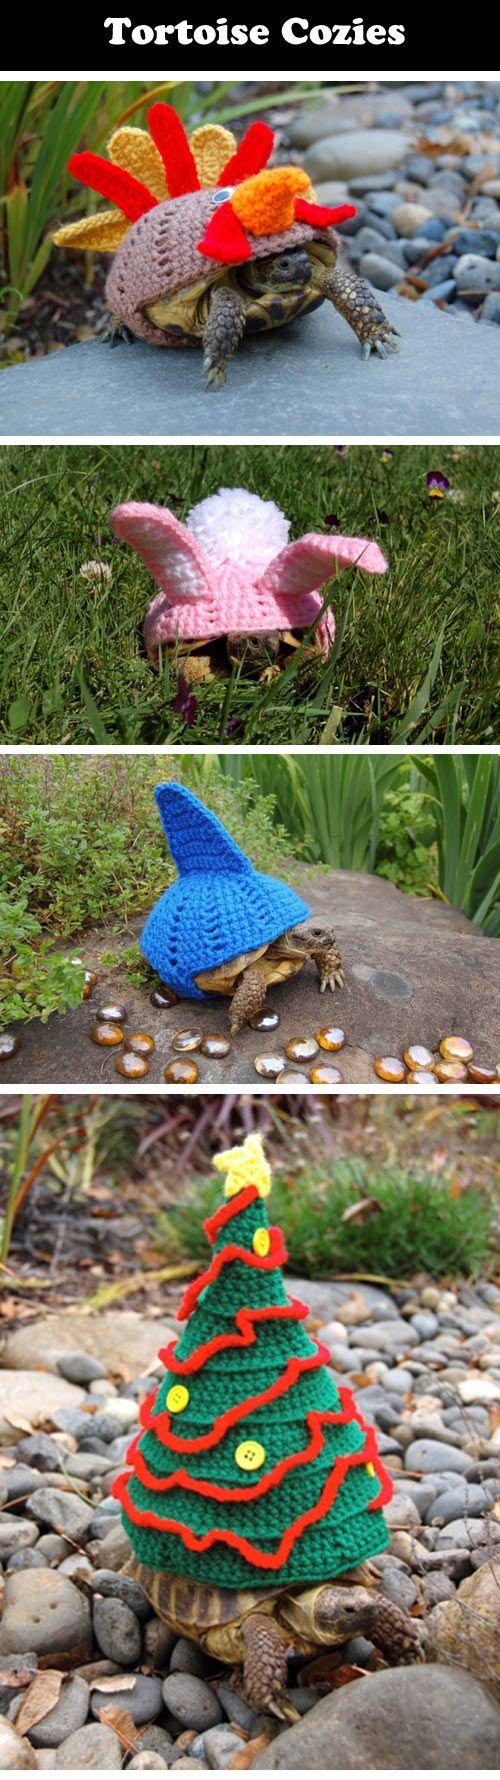 Magnificent tortoise cozies...